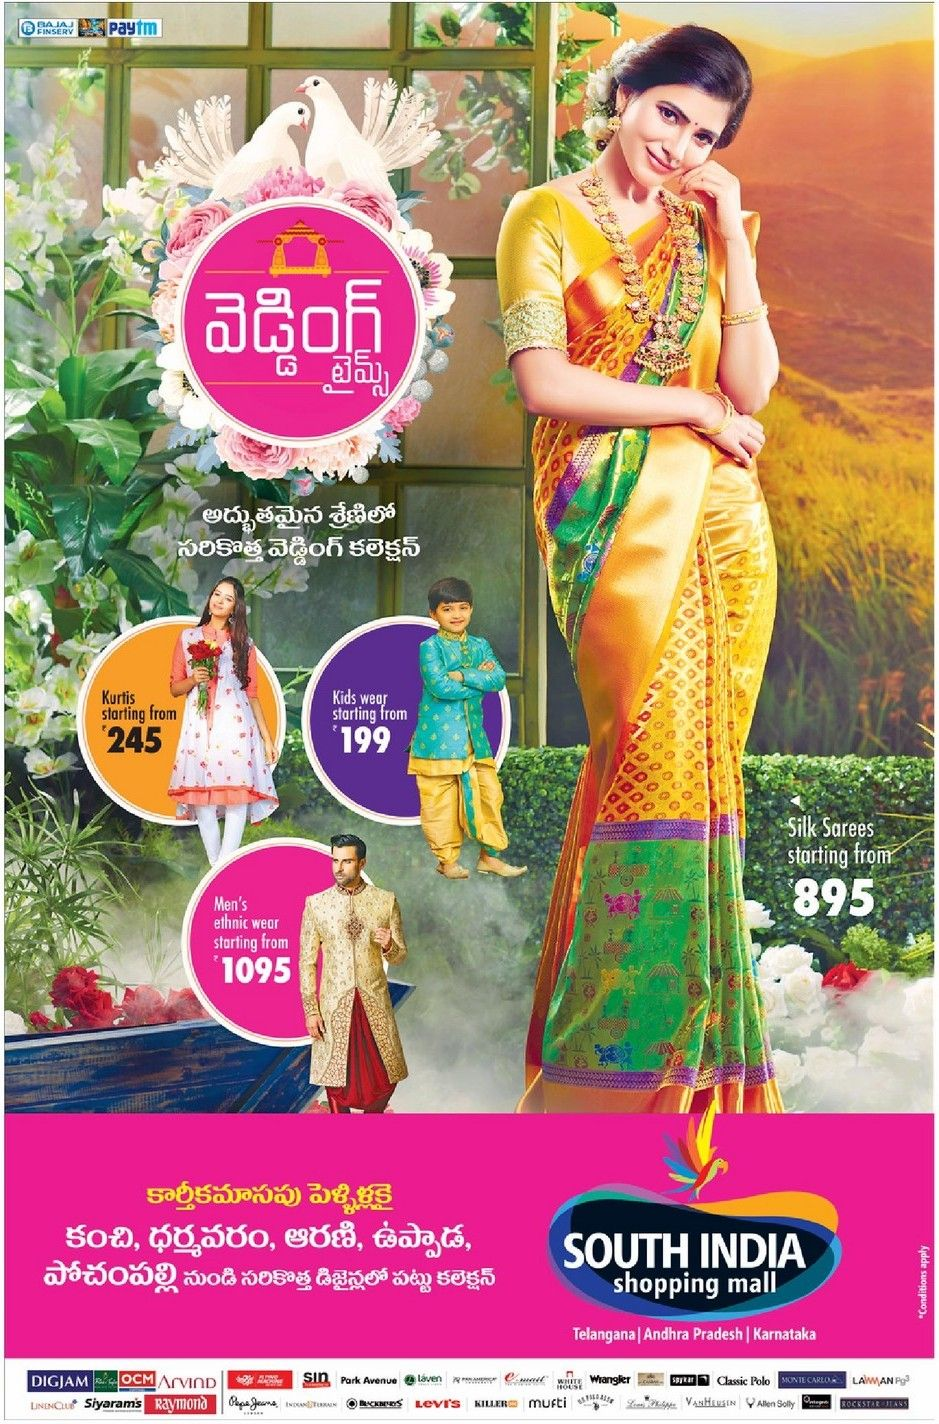 South India Shopping Mall Wedding Times Ad In Eenadu Hyderabad